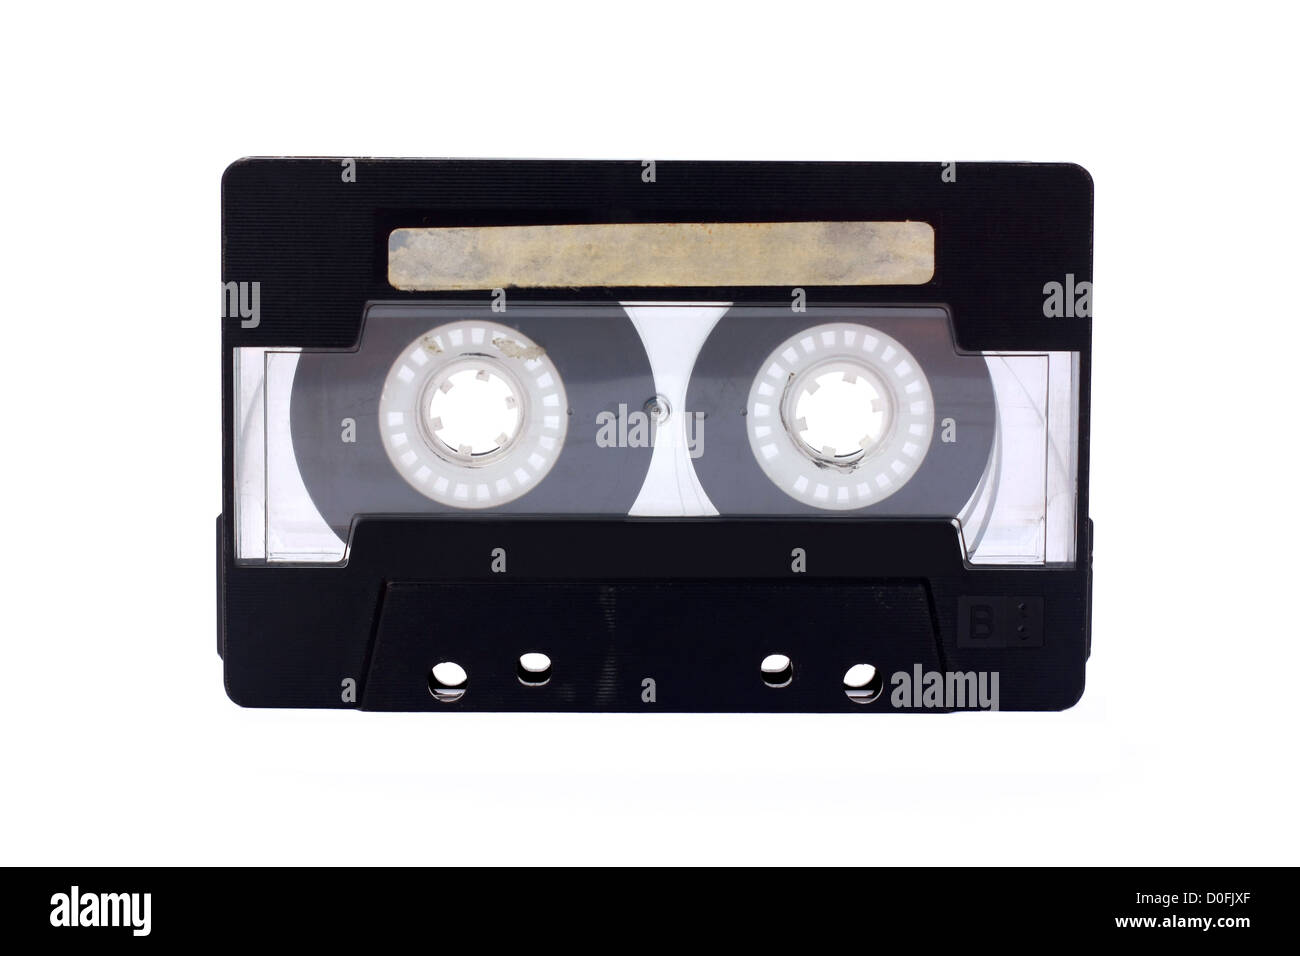 Transparent noir cassette compacte isolated on white Photo Stock